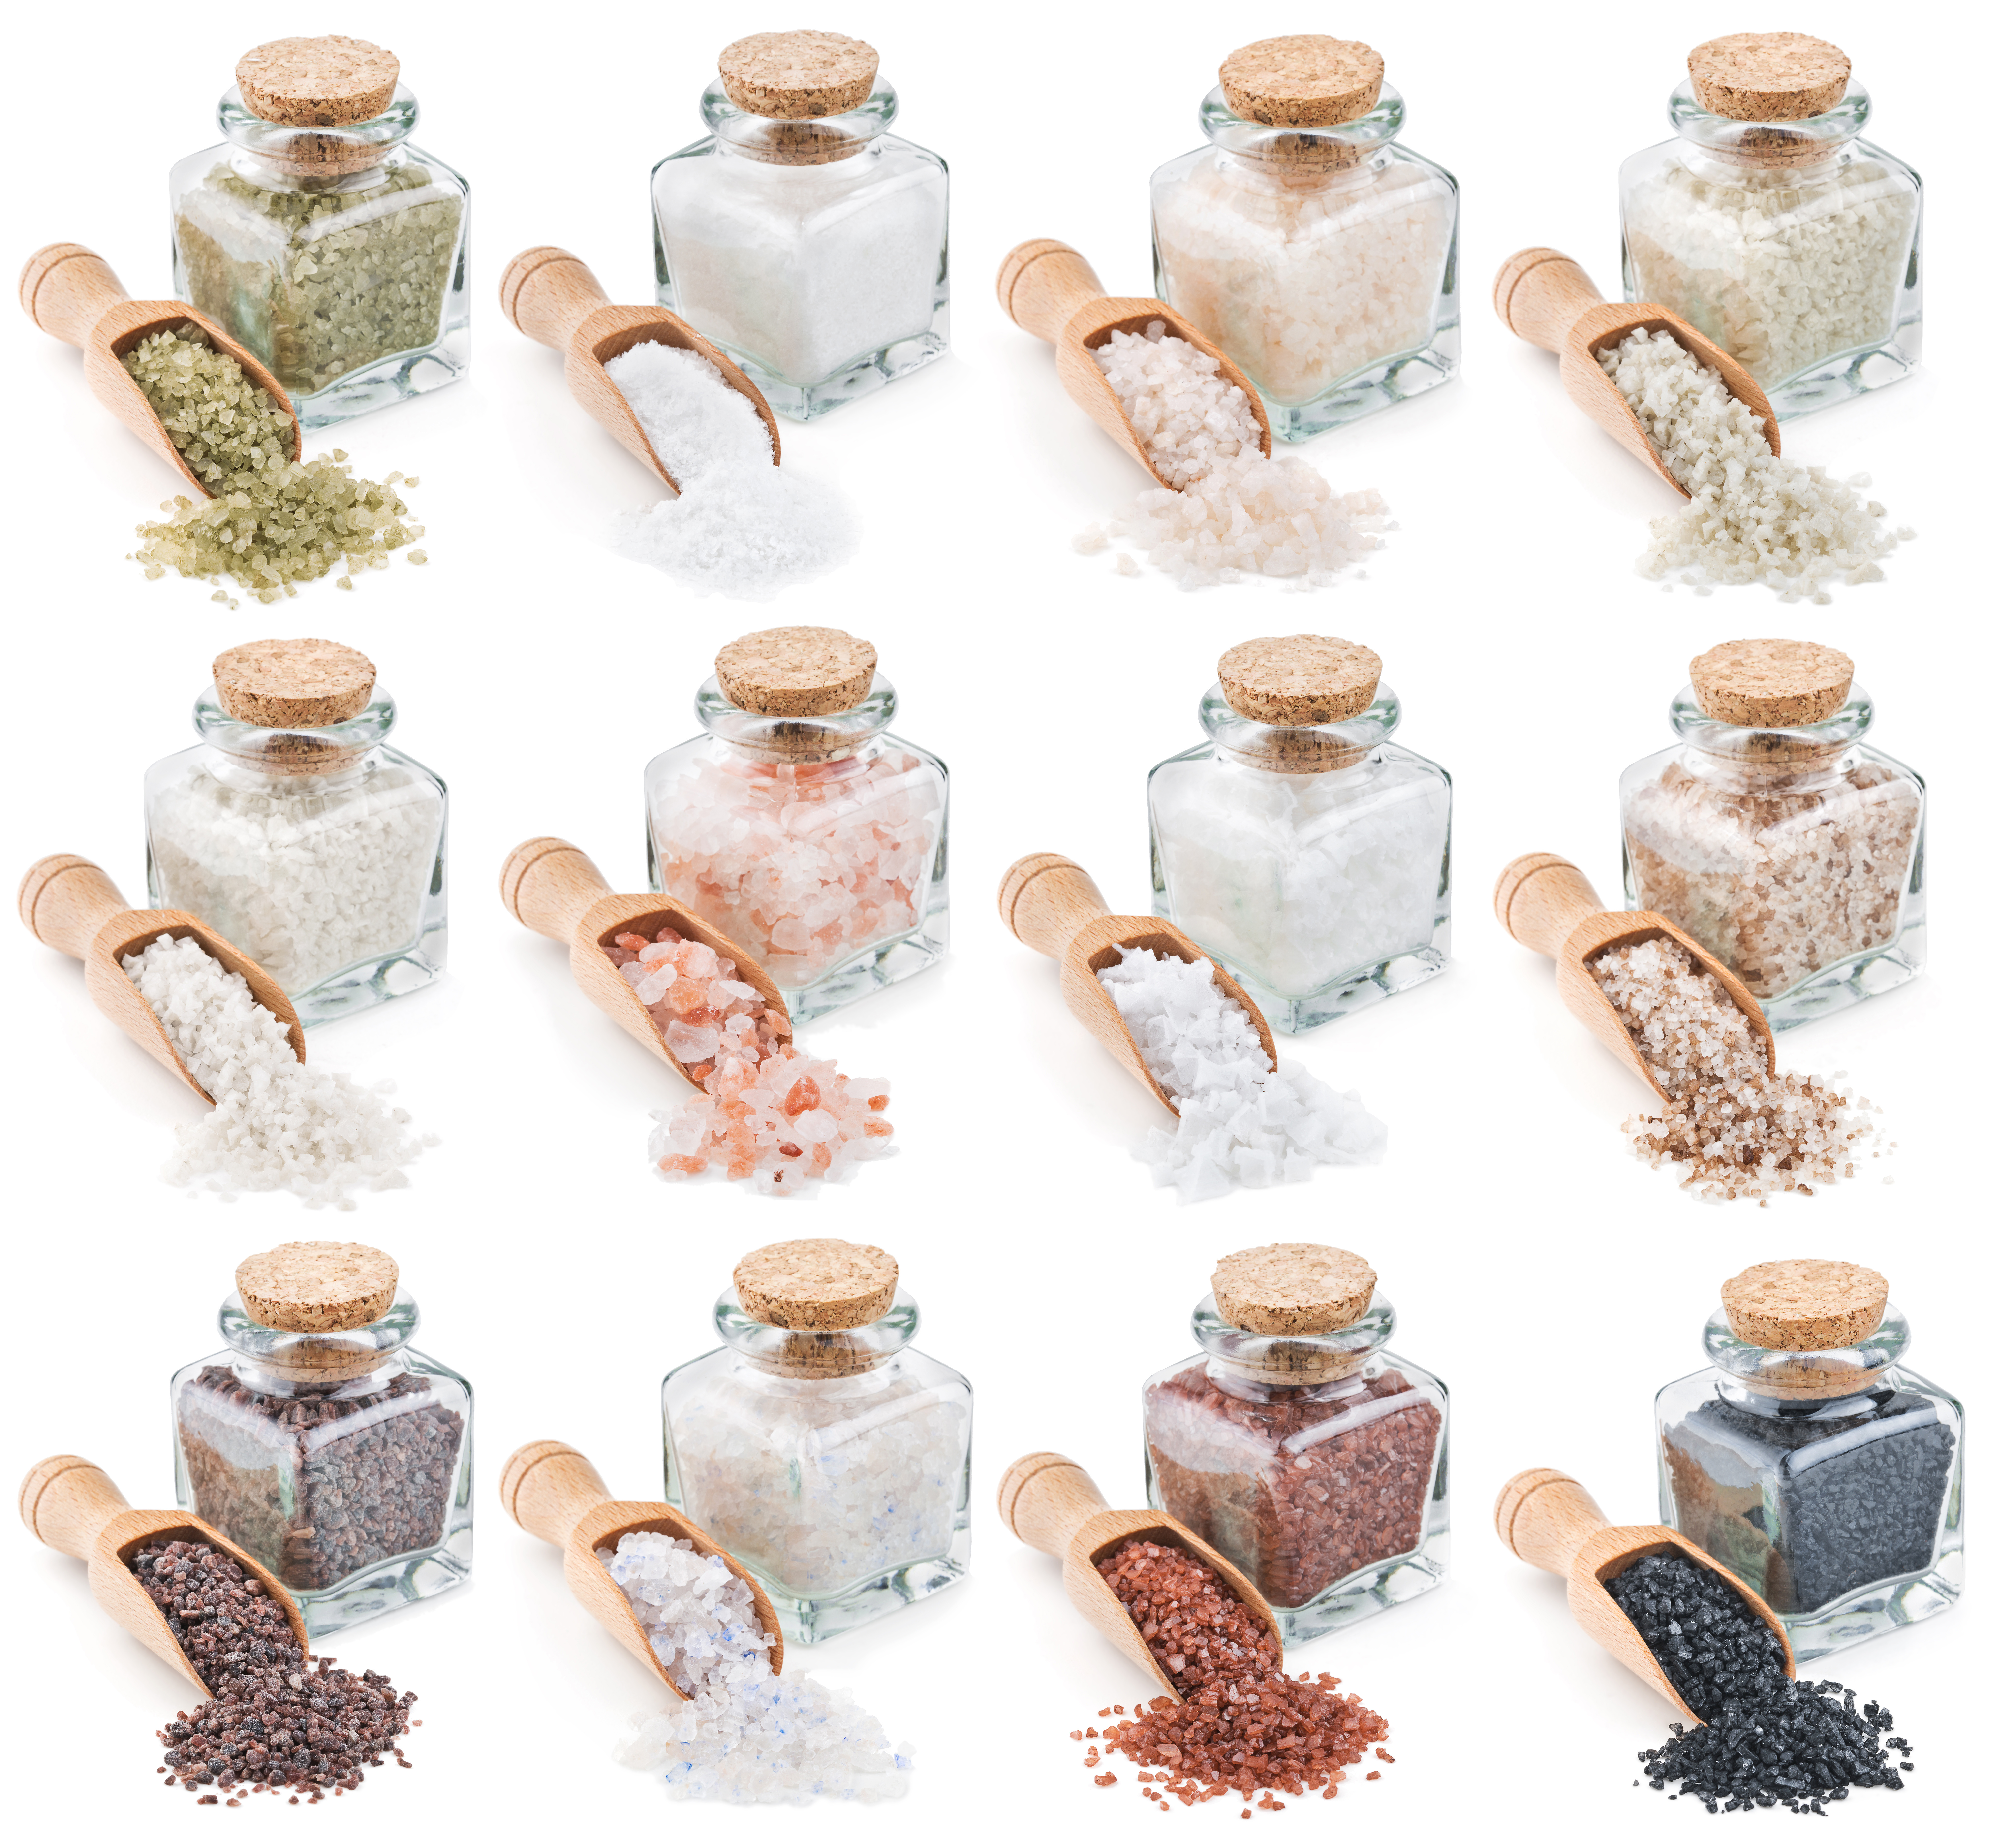 Types of Salts